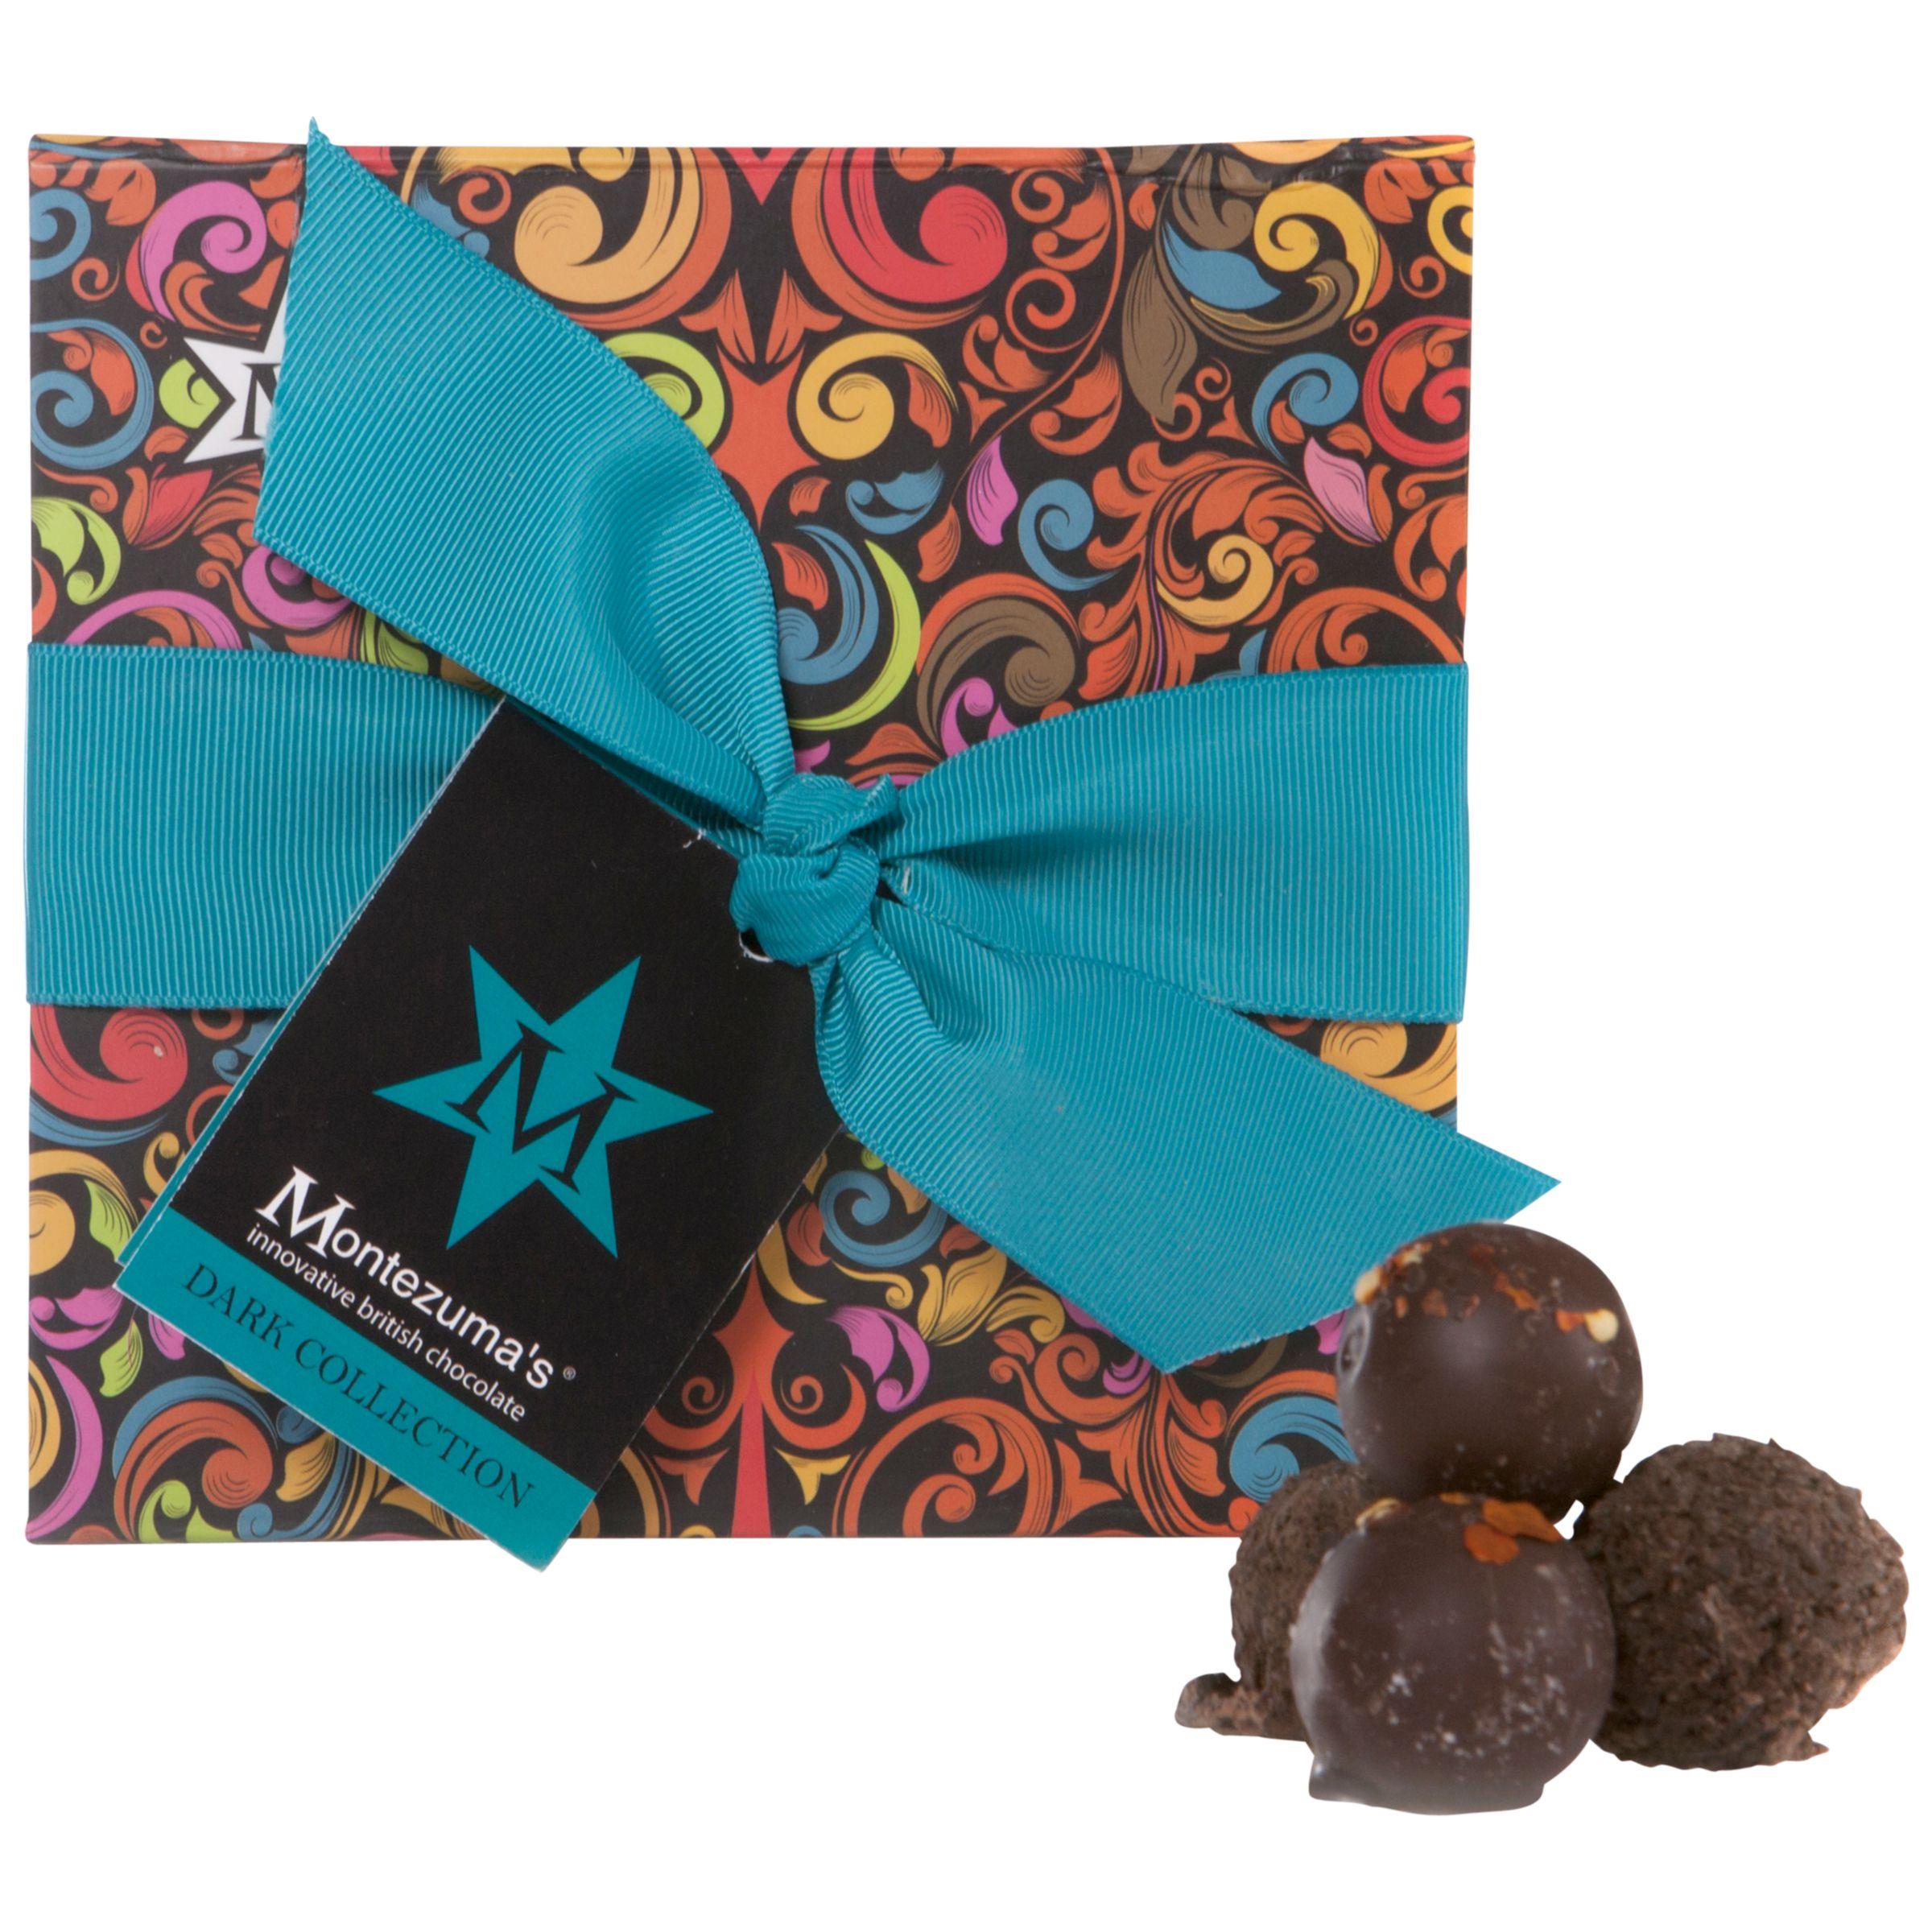 Montezuma's Montezuma's Dark Truffle Collection Small, 210g